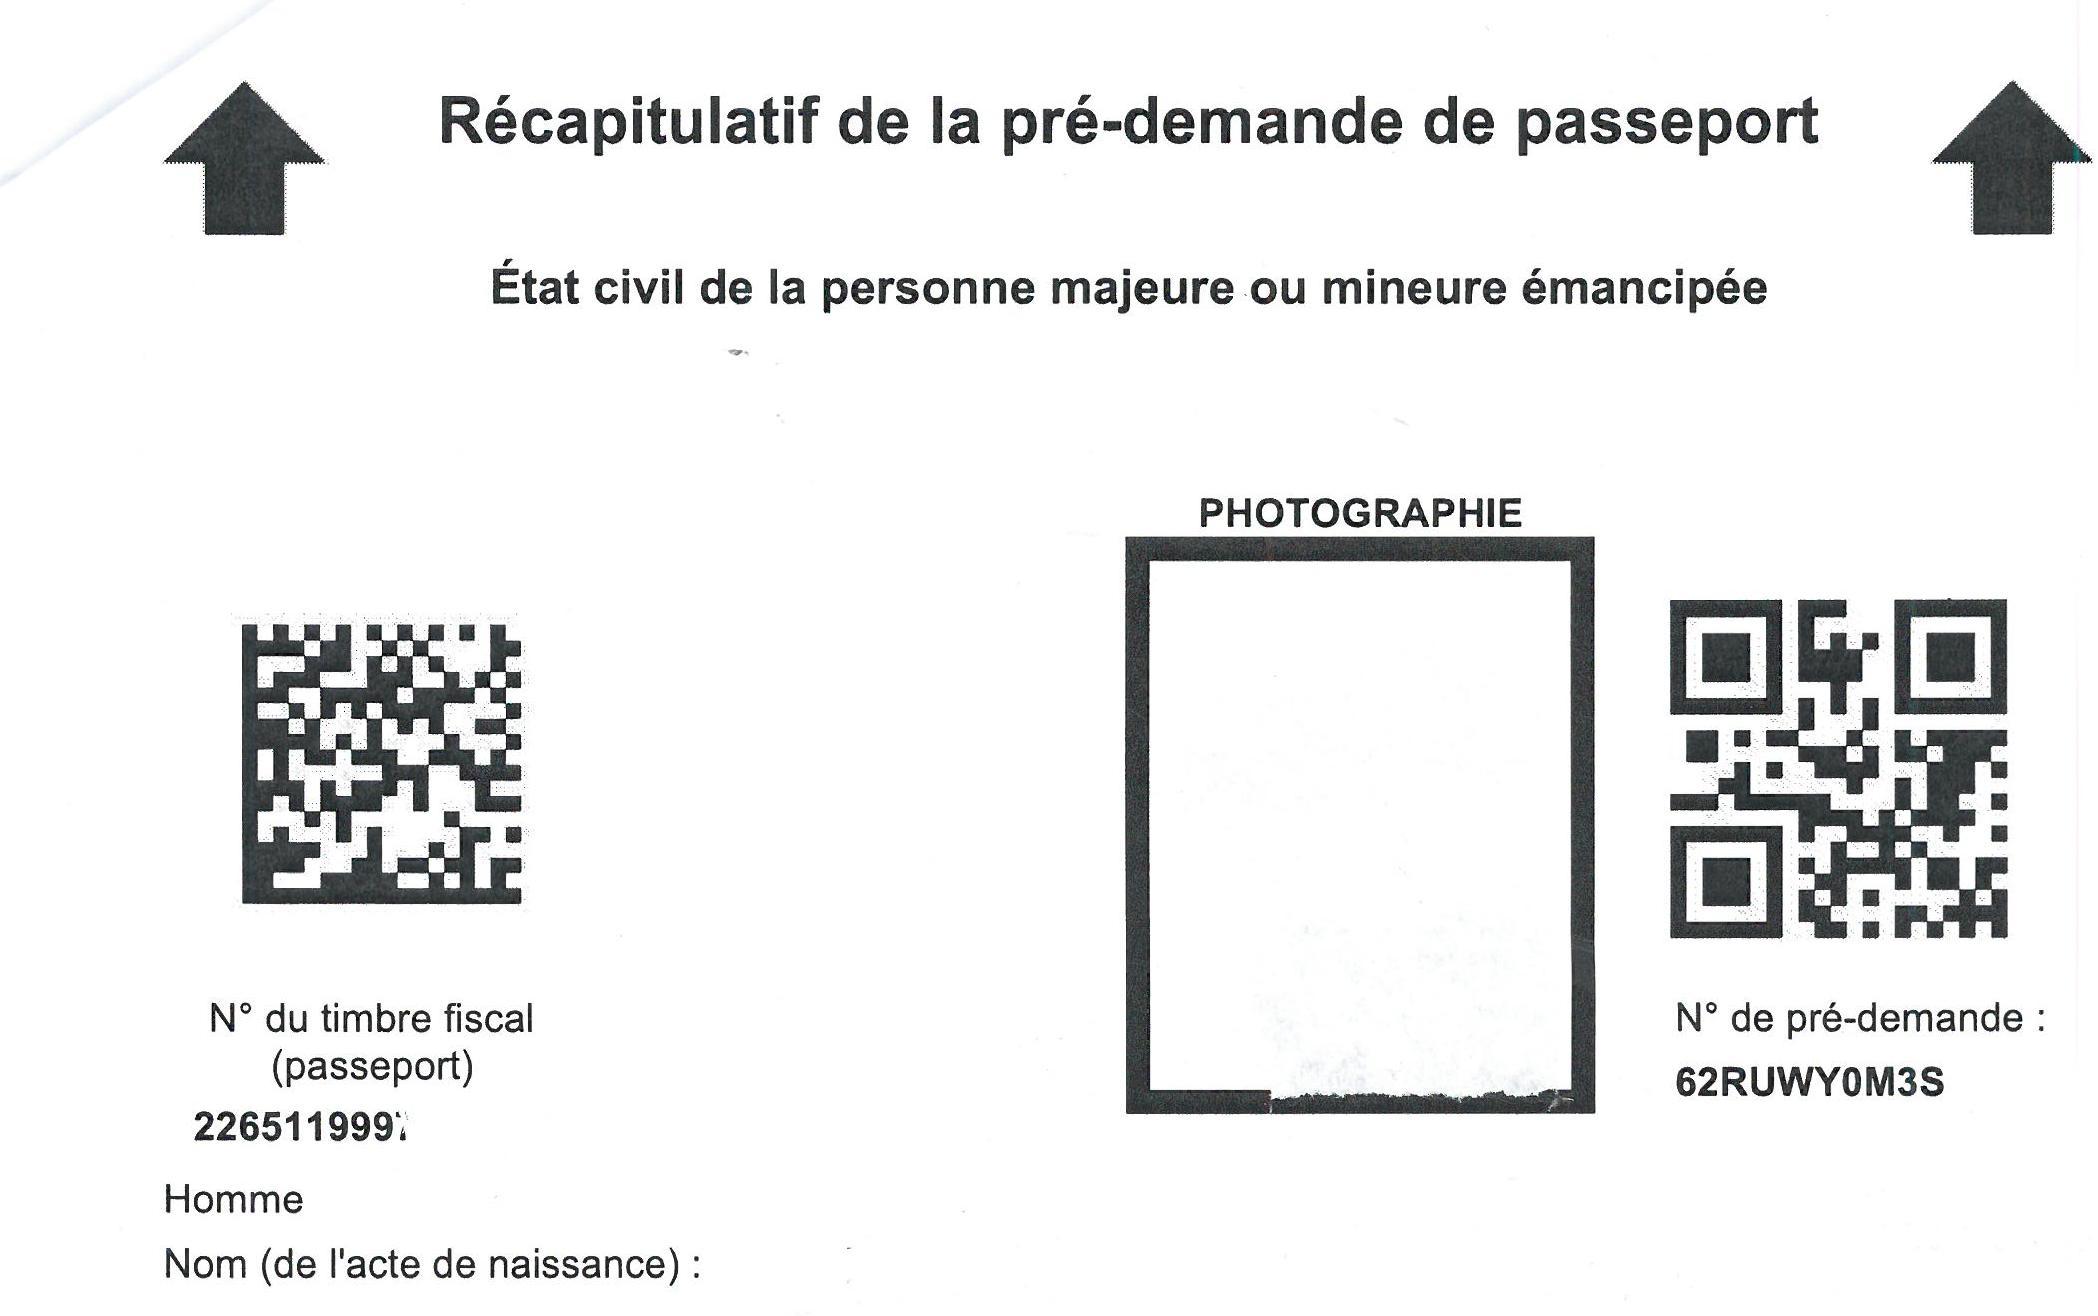 prédemande de passeport